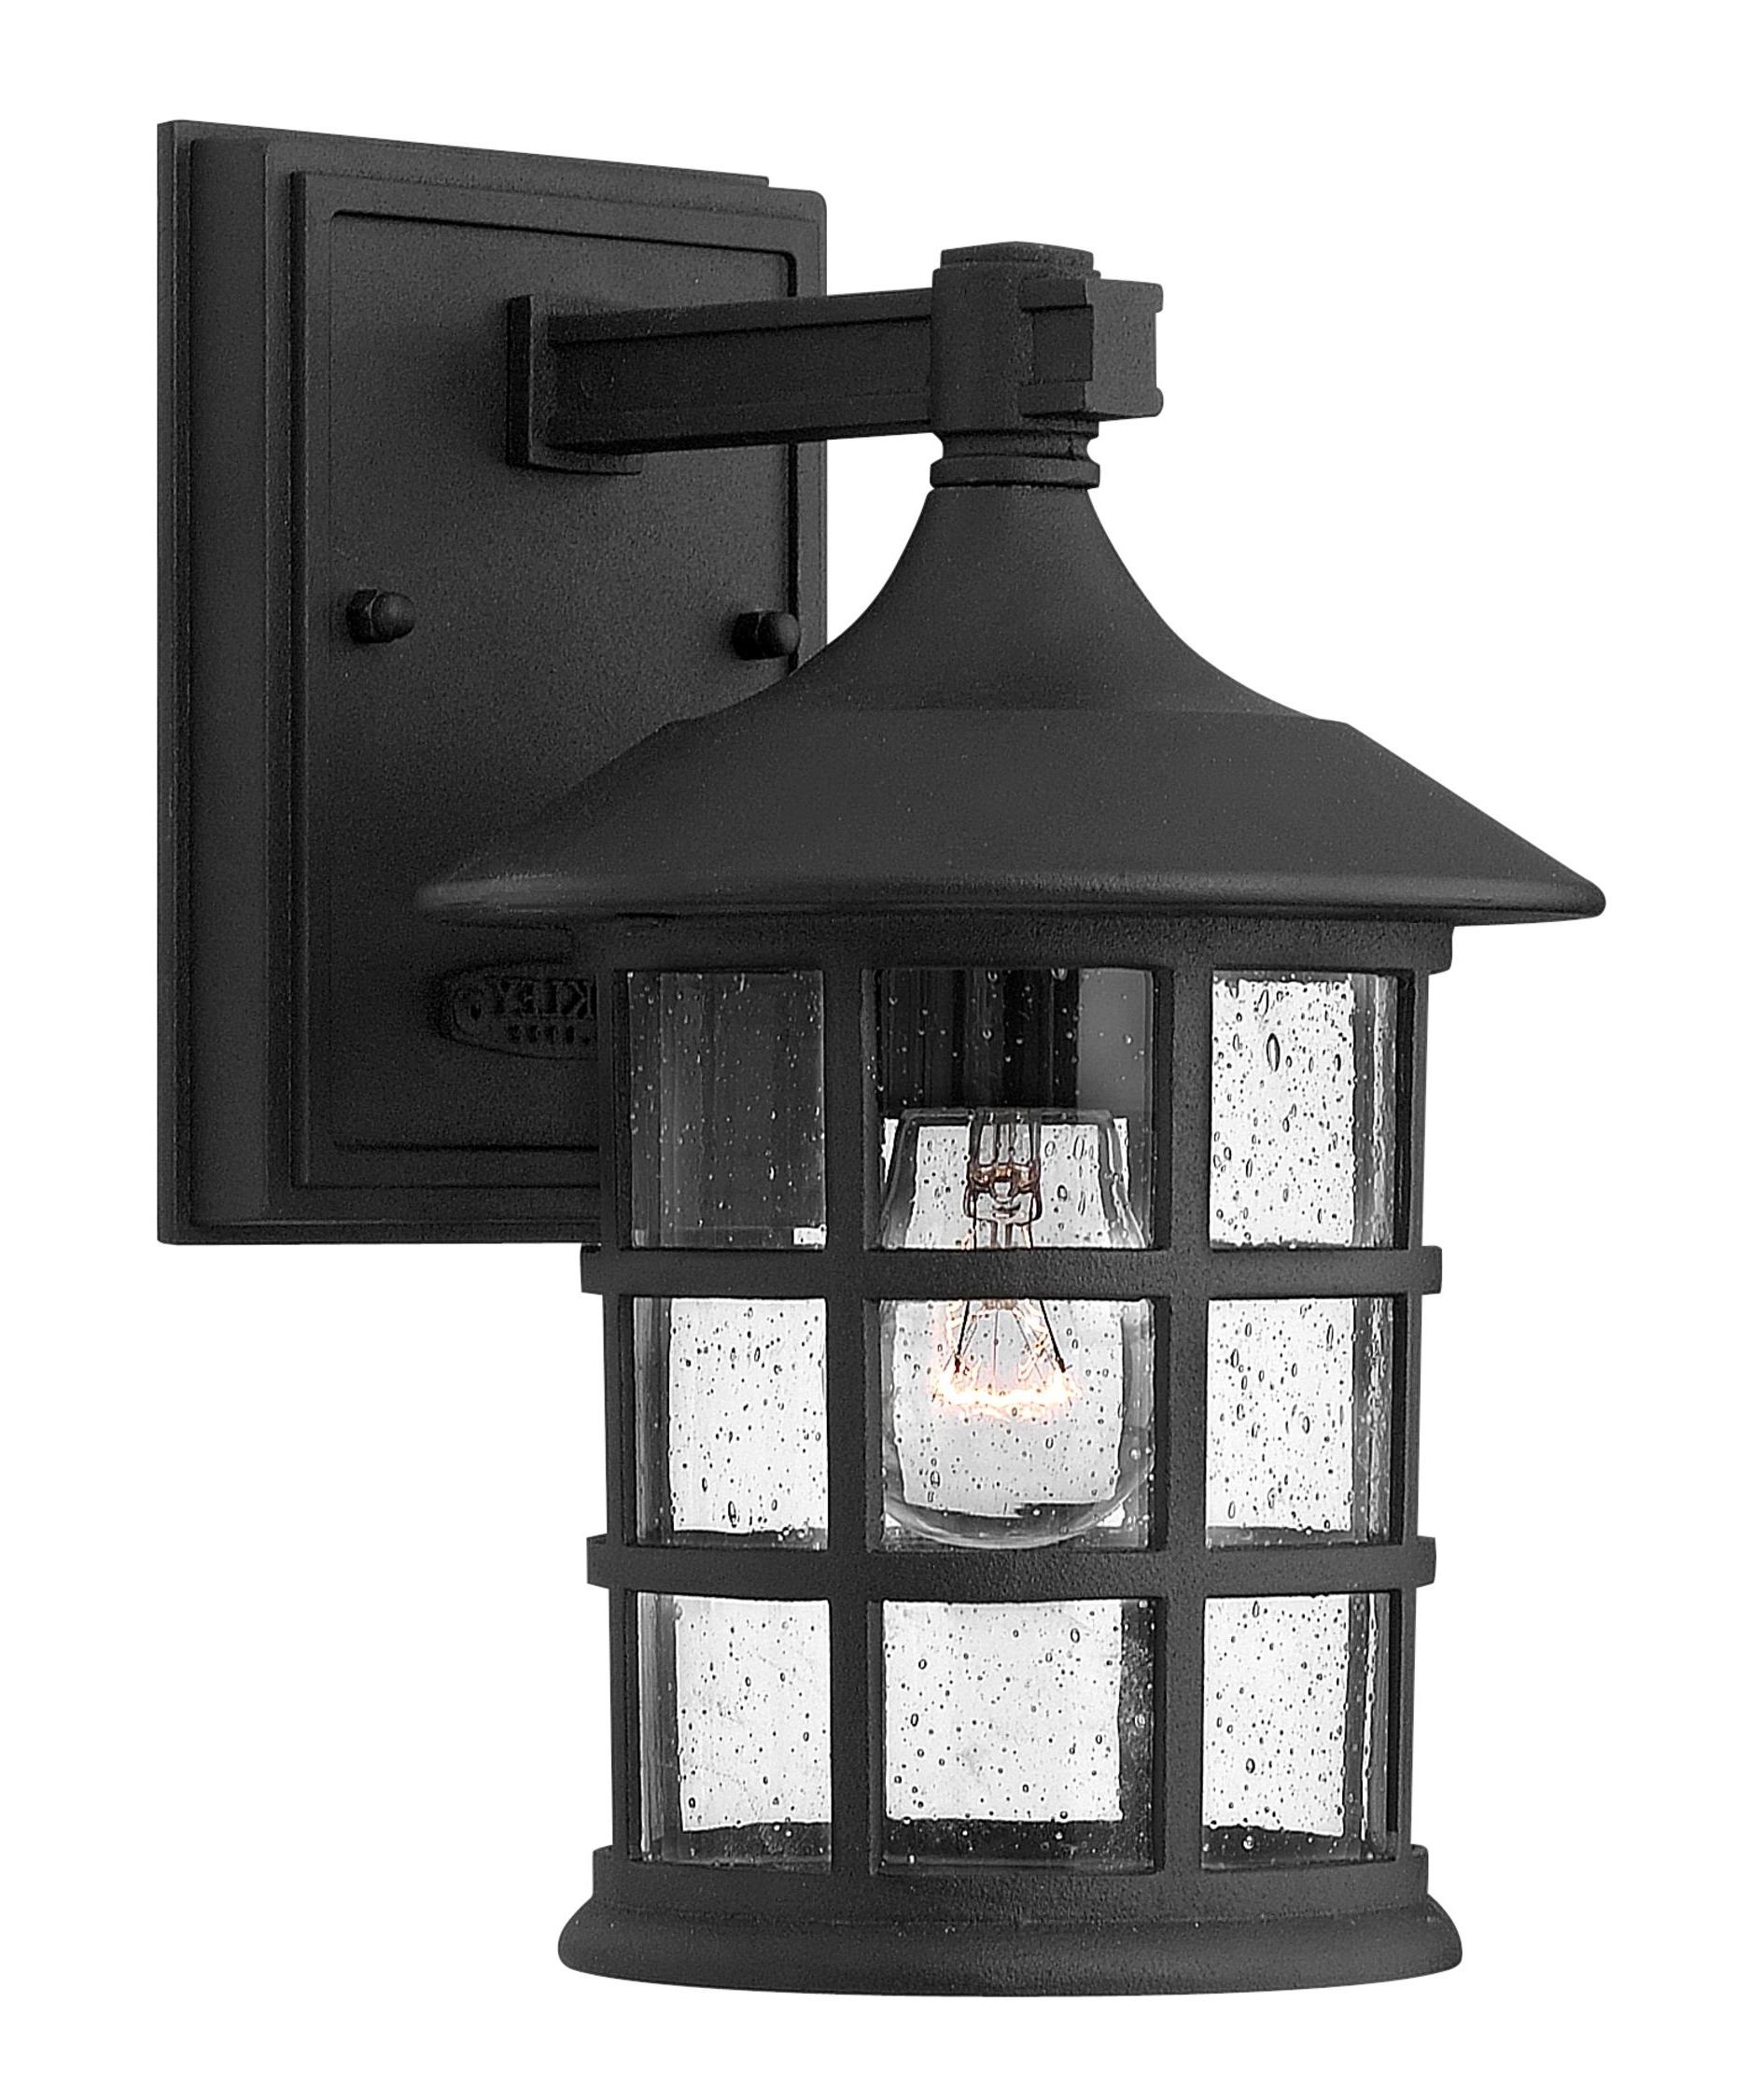 Outdoor Wall Garage Lights In Favorite Hinkley Lighting 1800 Freeport 6 Inch Wide 1 Light Outdoor Wall (View 10 of 20)